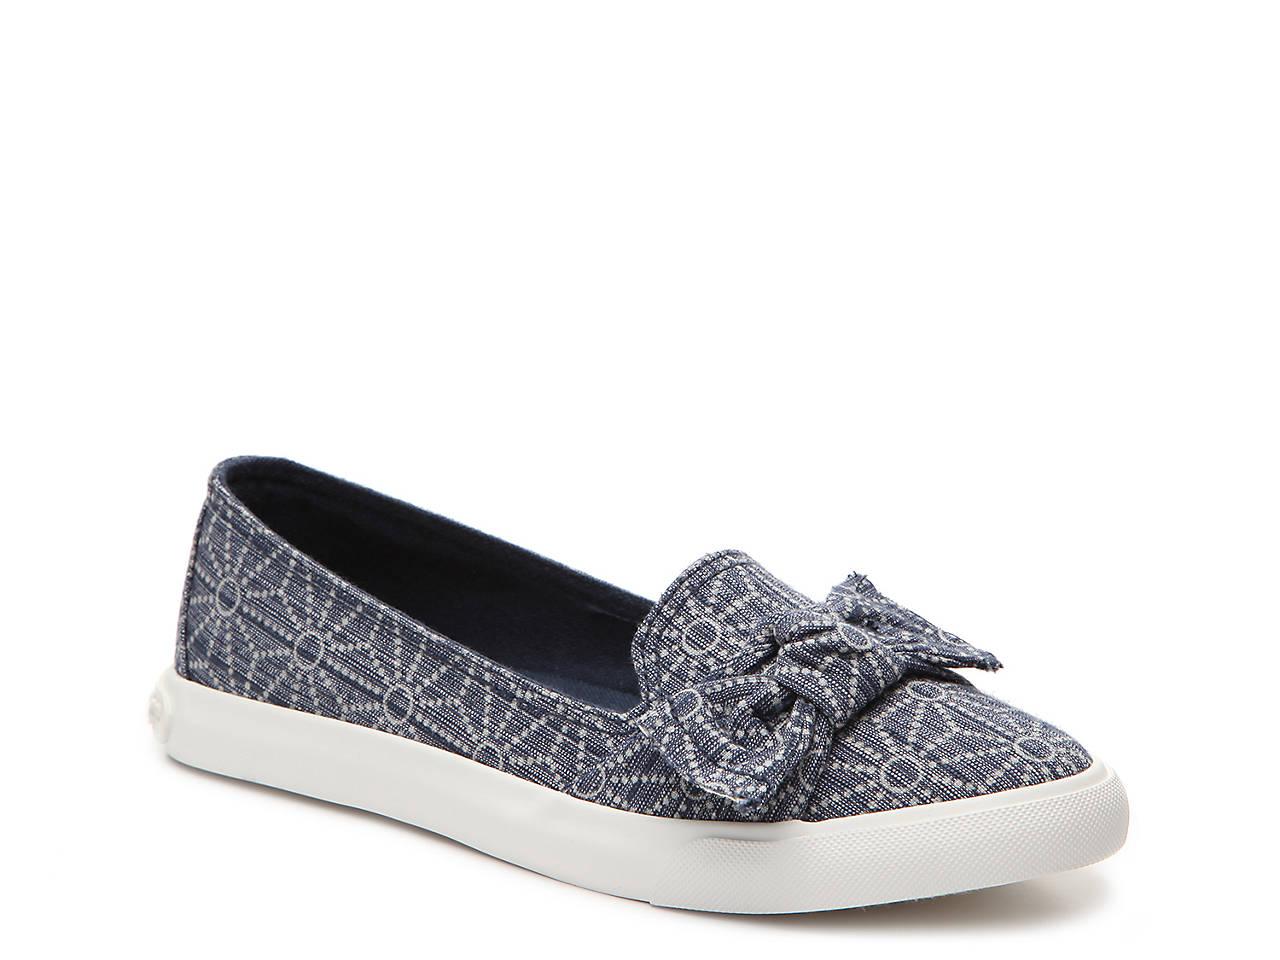 ad57f055777 Clarita Slip-On Sneaker